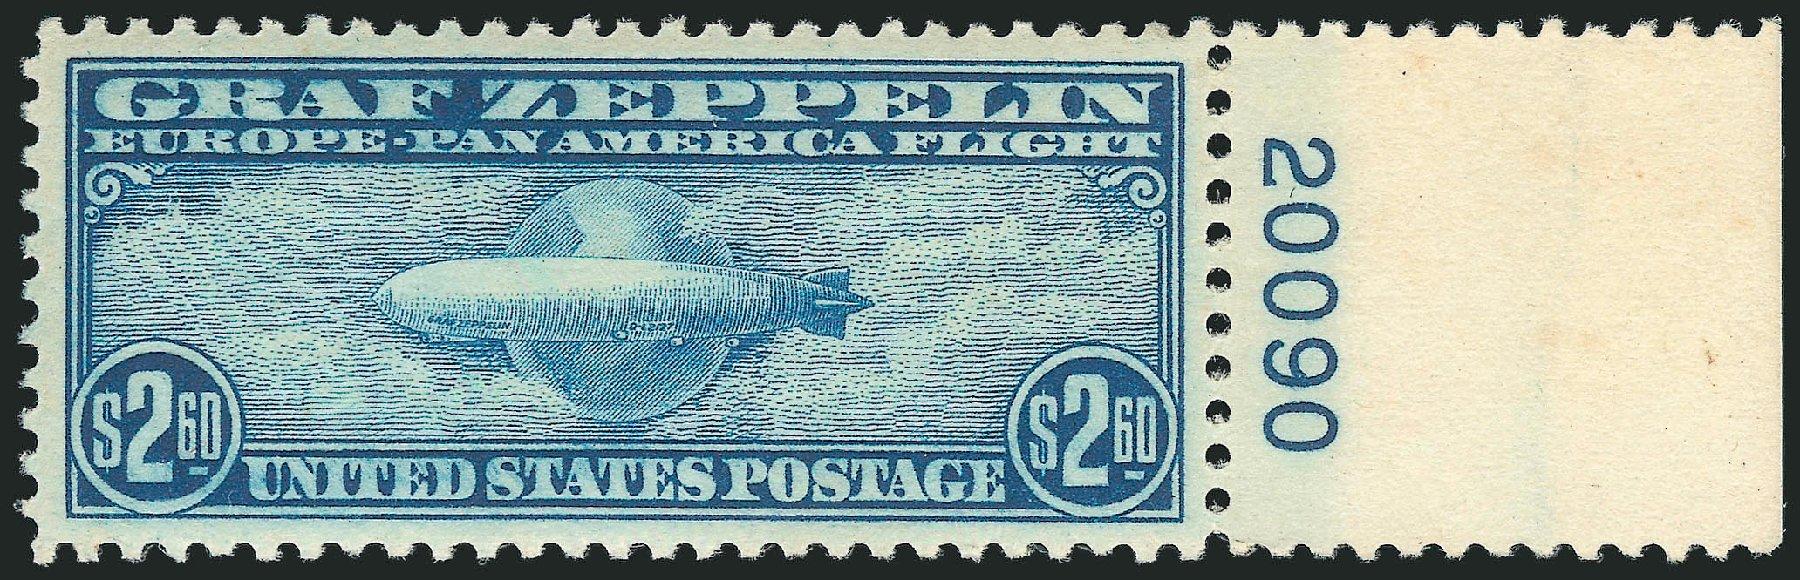 Price of US Stamp Scott Catalog # C15 - US$2.60 1930 Air Graf Zeppelin. Robert Siegel Auction Galleries, Feb 2015, Sale 1092, Lot 1416